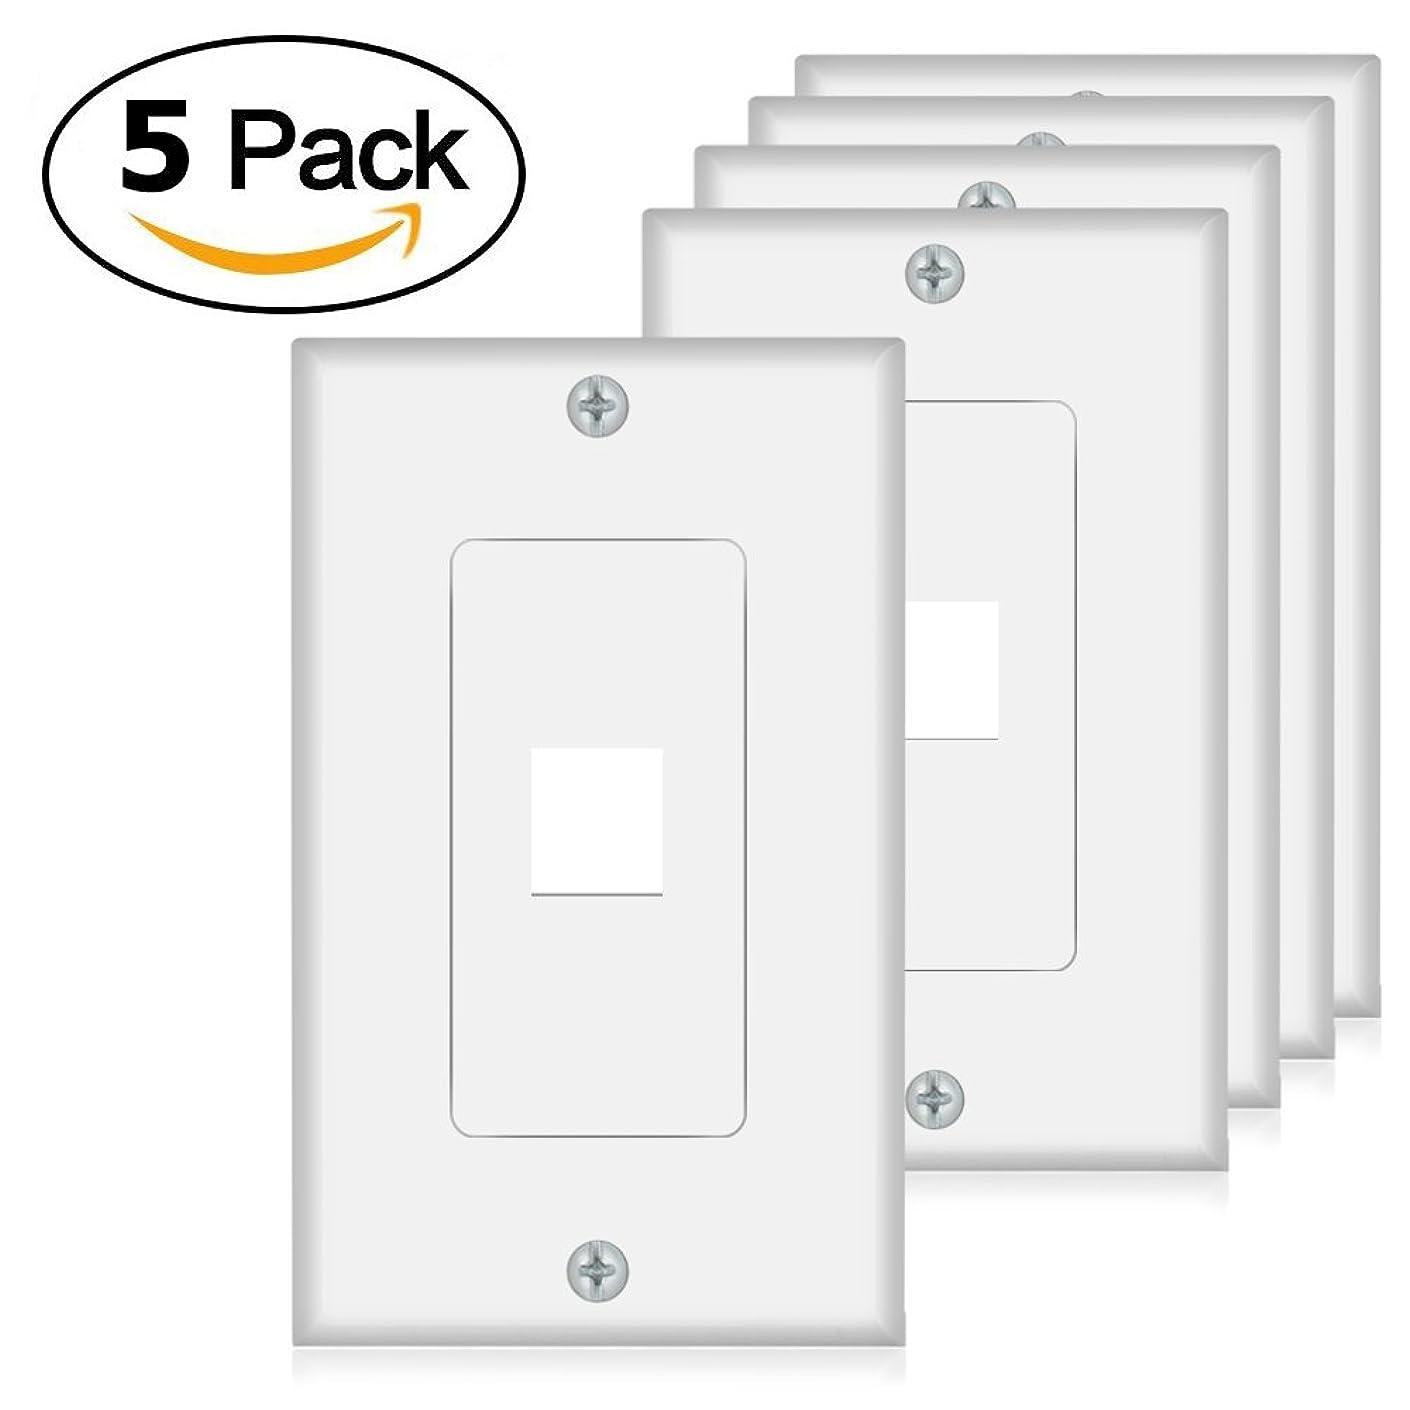 Keystone Wall Plate 1 Port (5 Pack